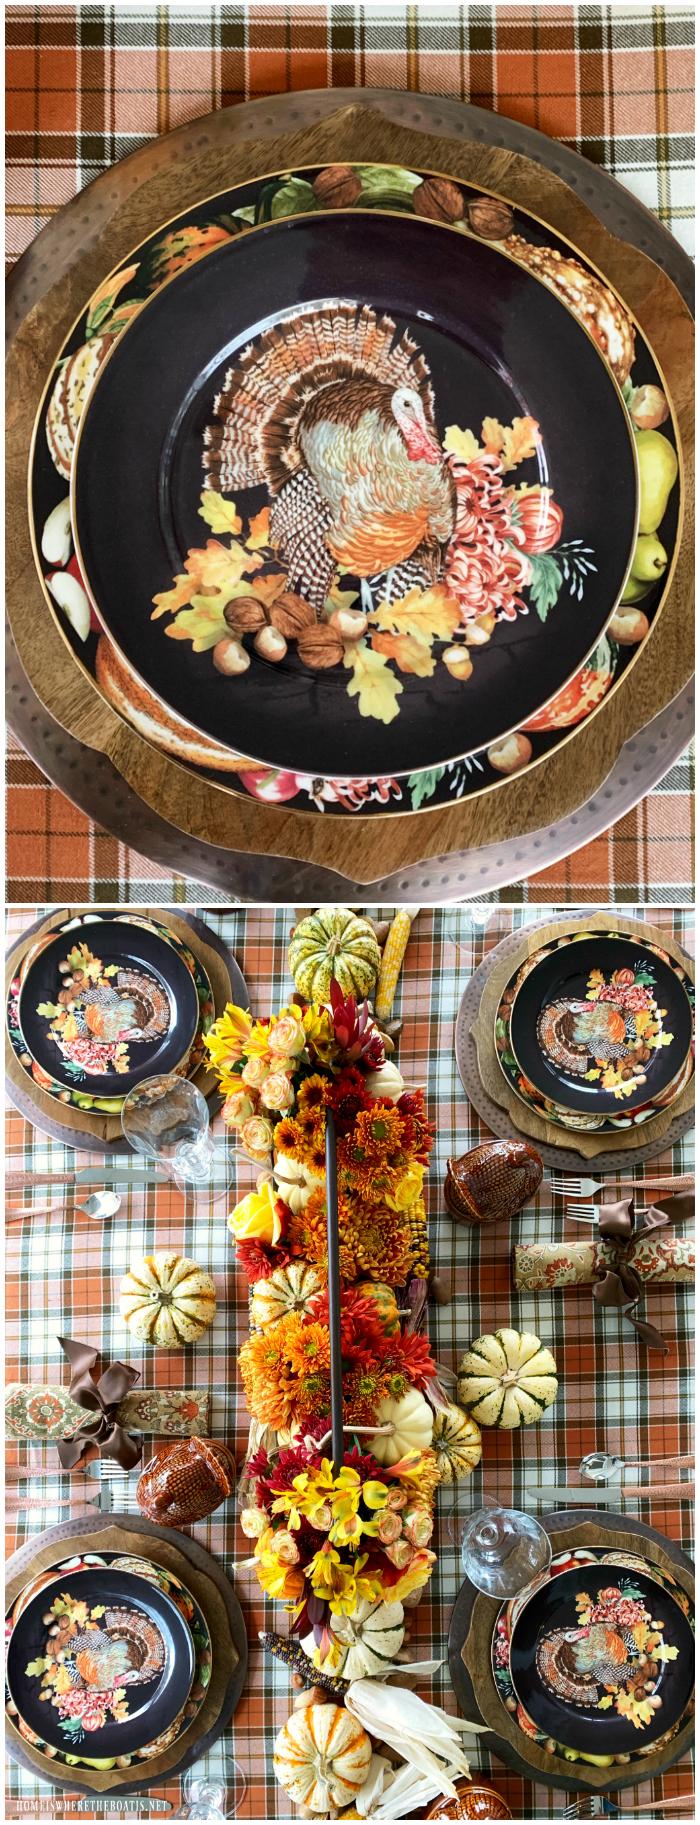 A Harvest of Blooms + Harvest Pumpkin Turkey Tablescape | ©homeiswheretheboatis.net #thanksgiving #tablescapes